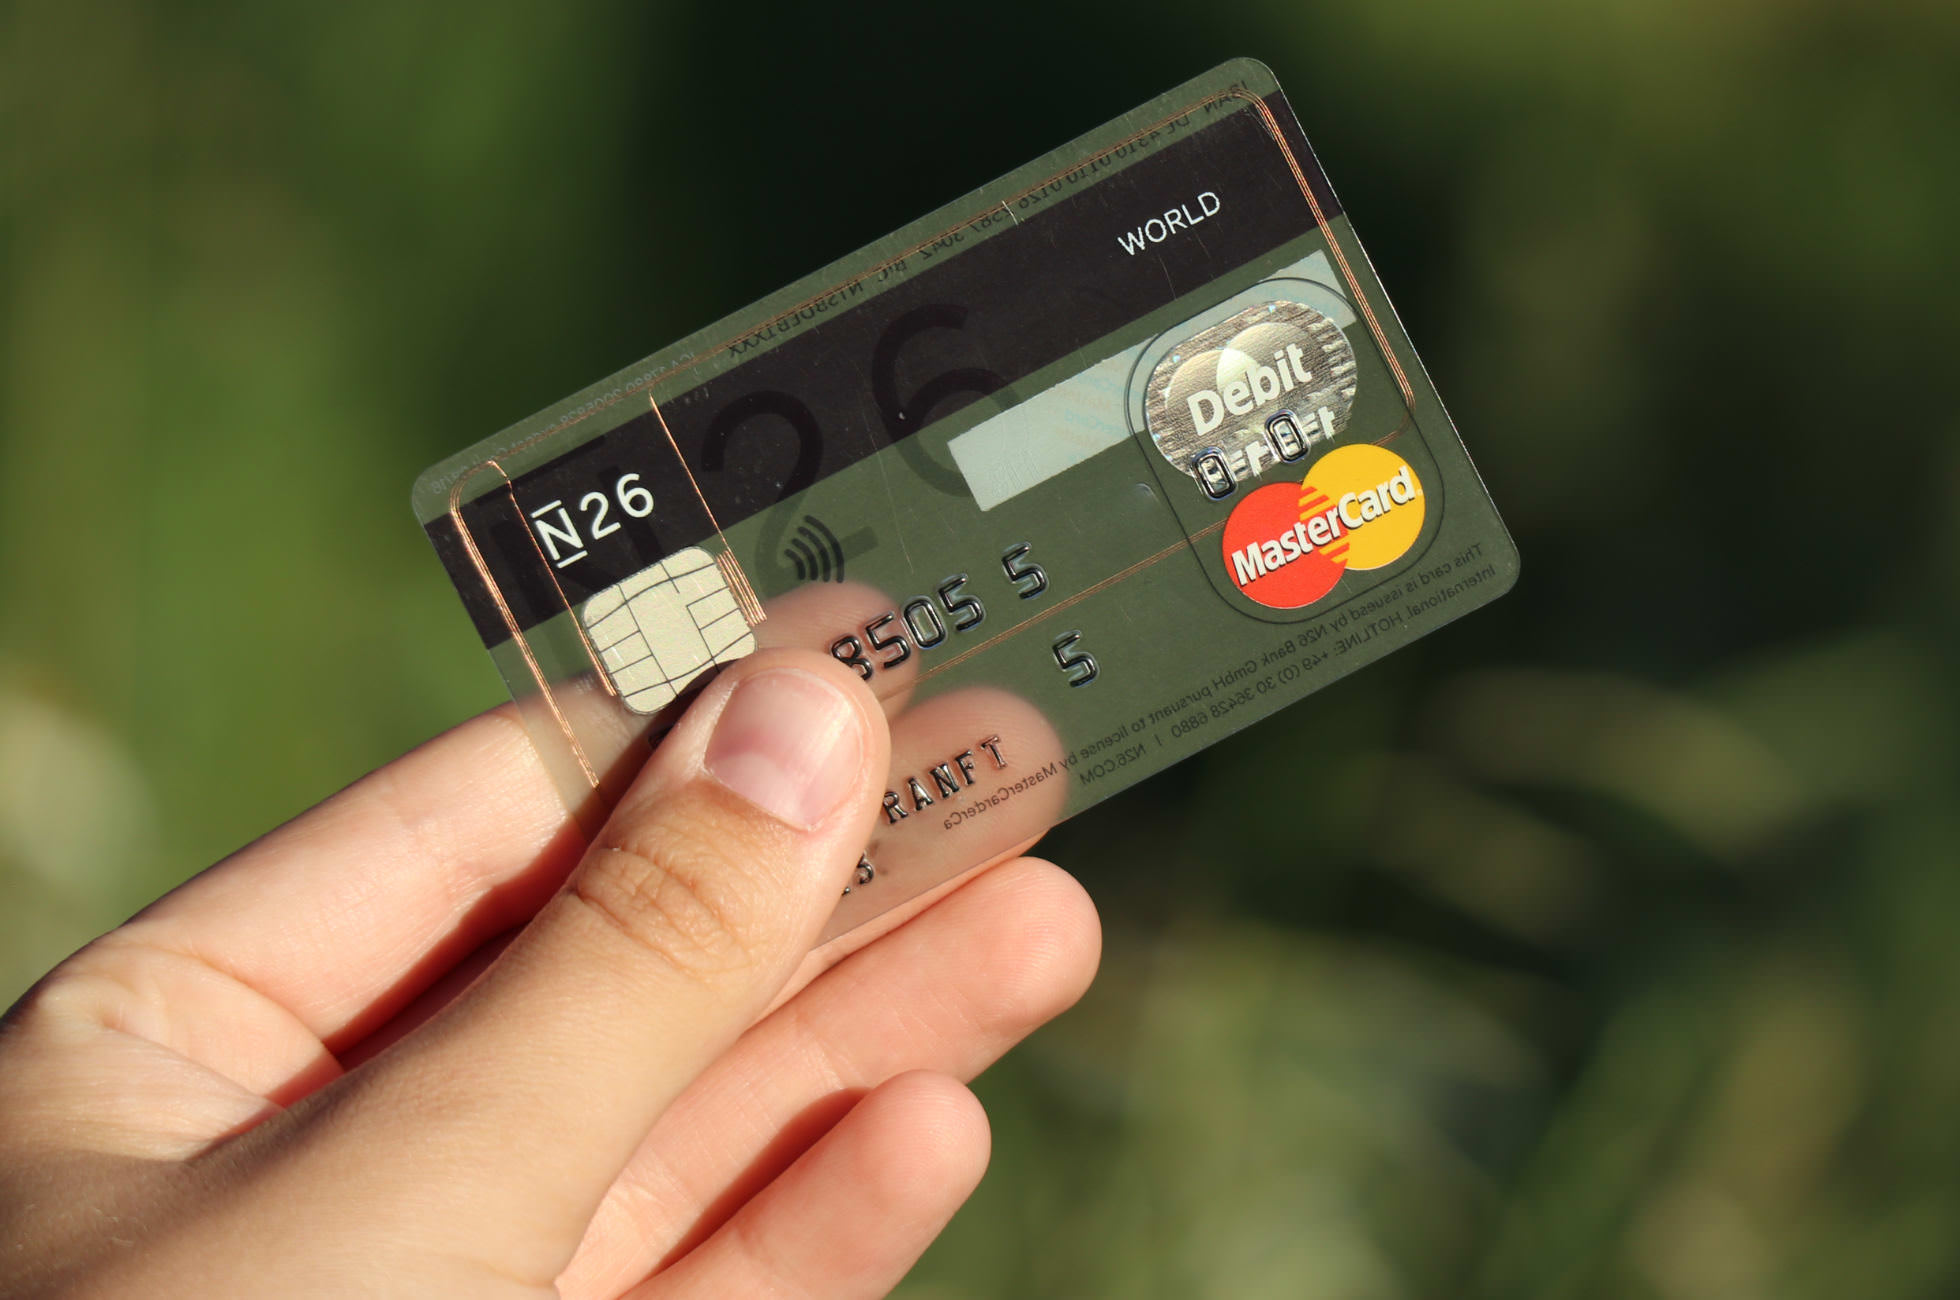 N26 Kreditkarte kostenlos